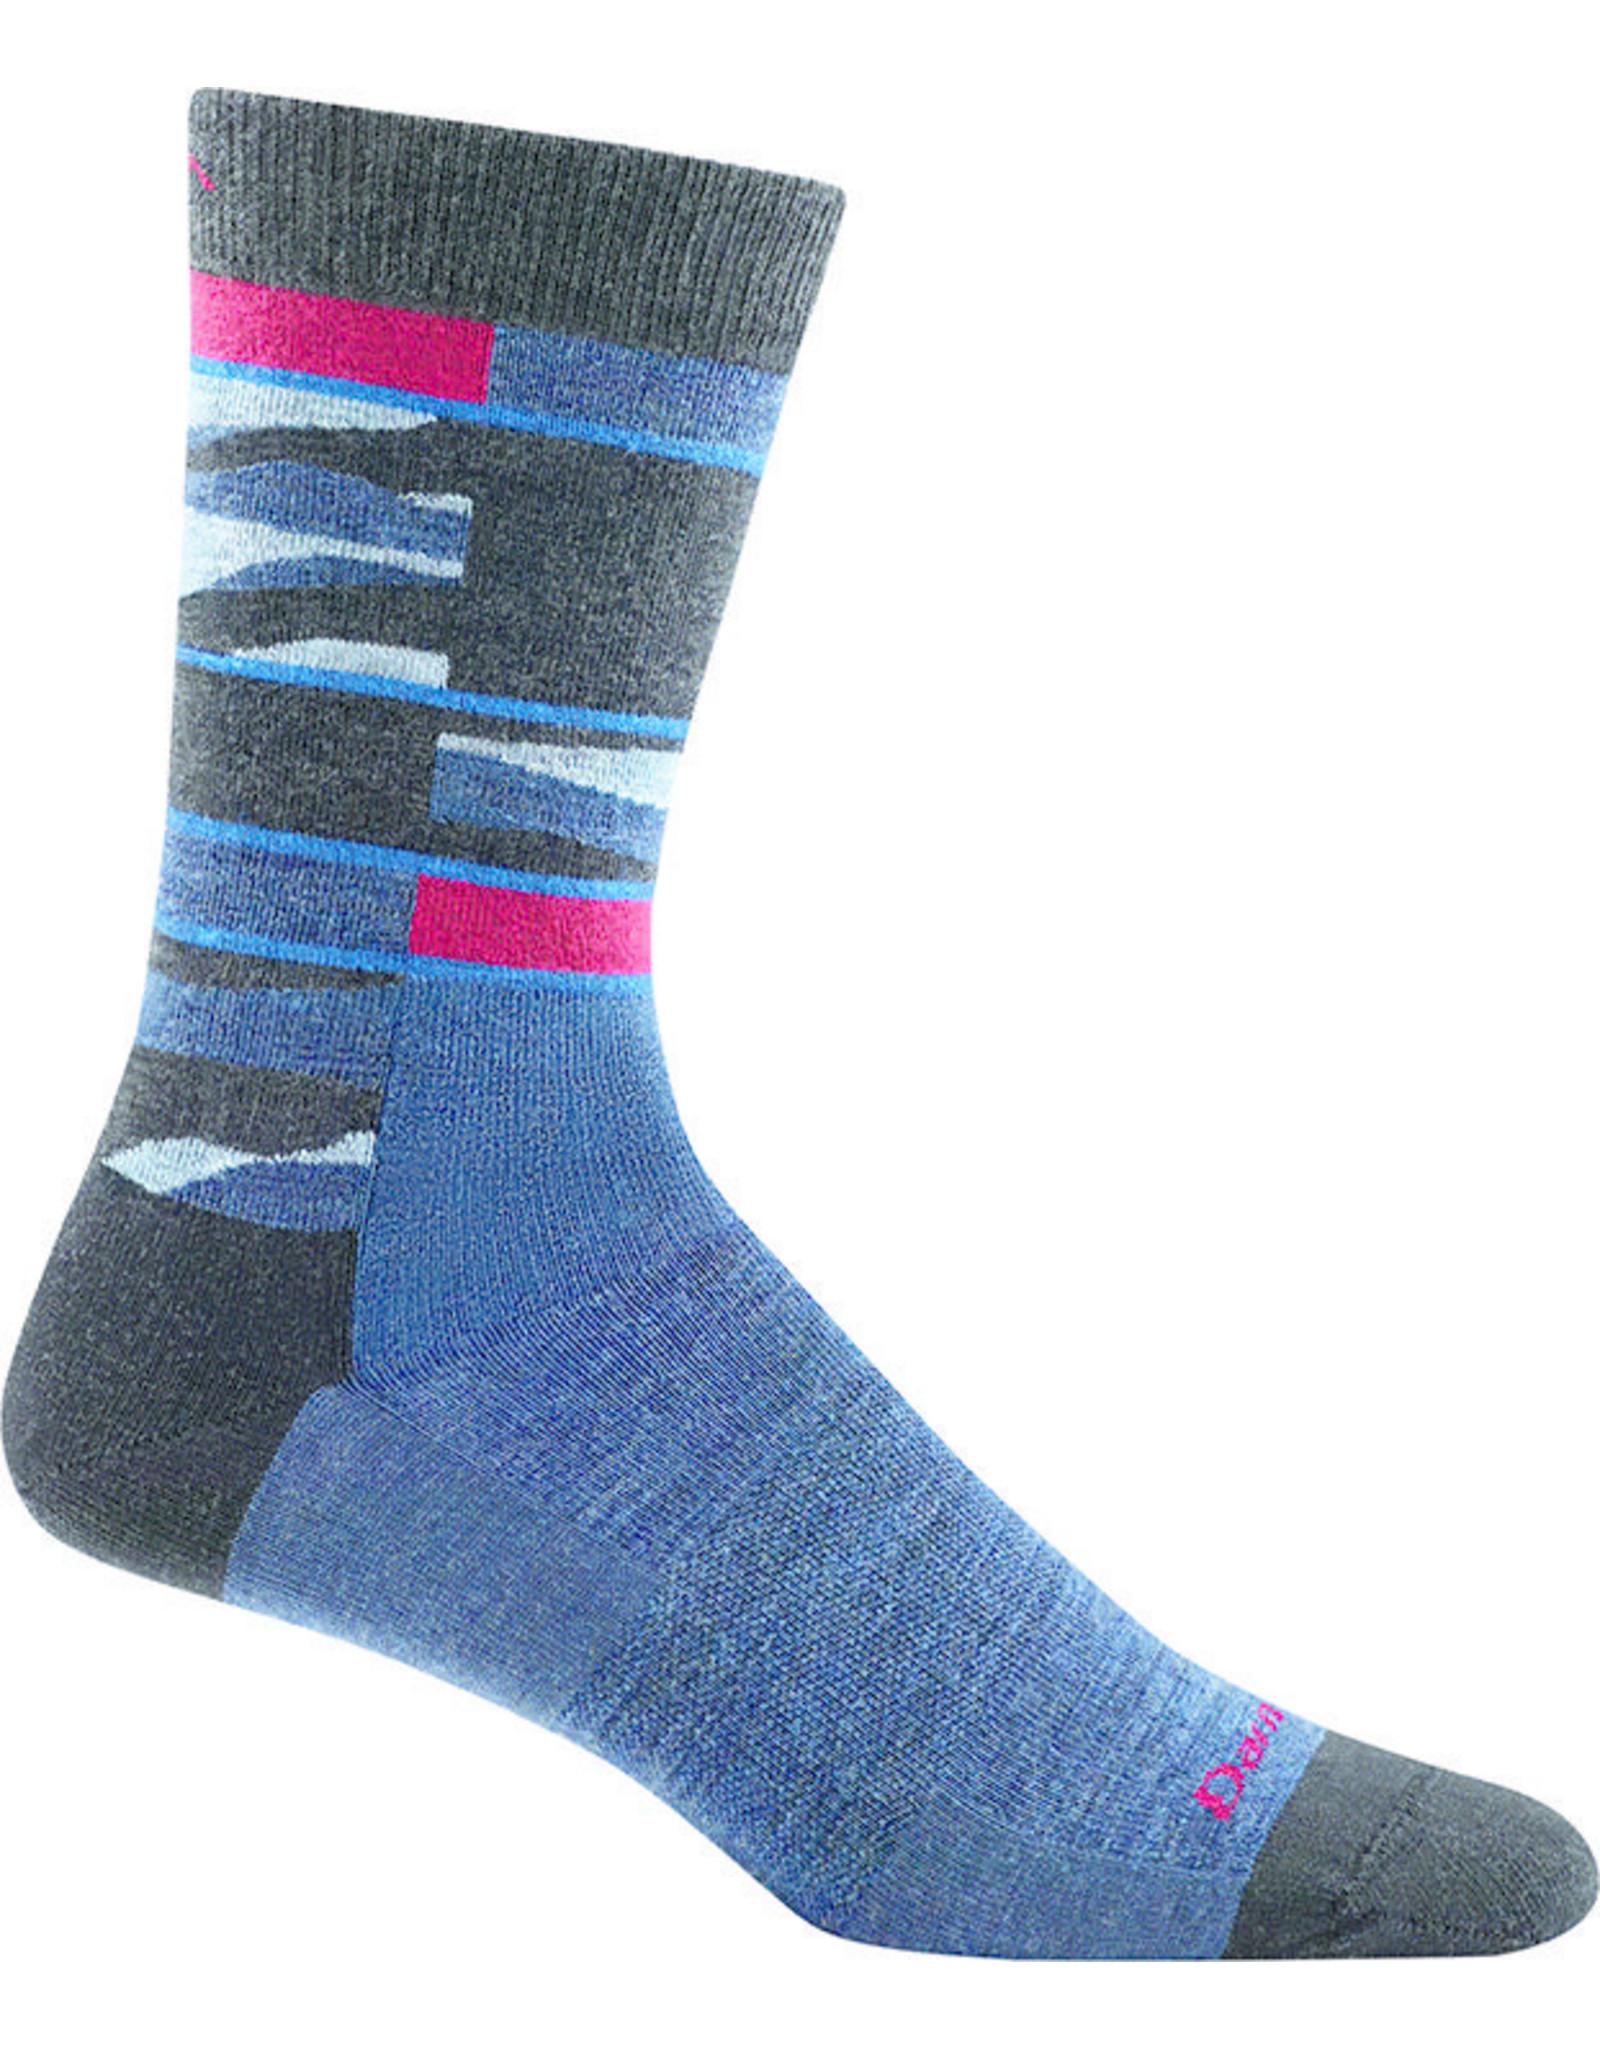 Darn Tough Icefields Men's Crew Sock